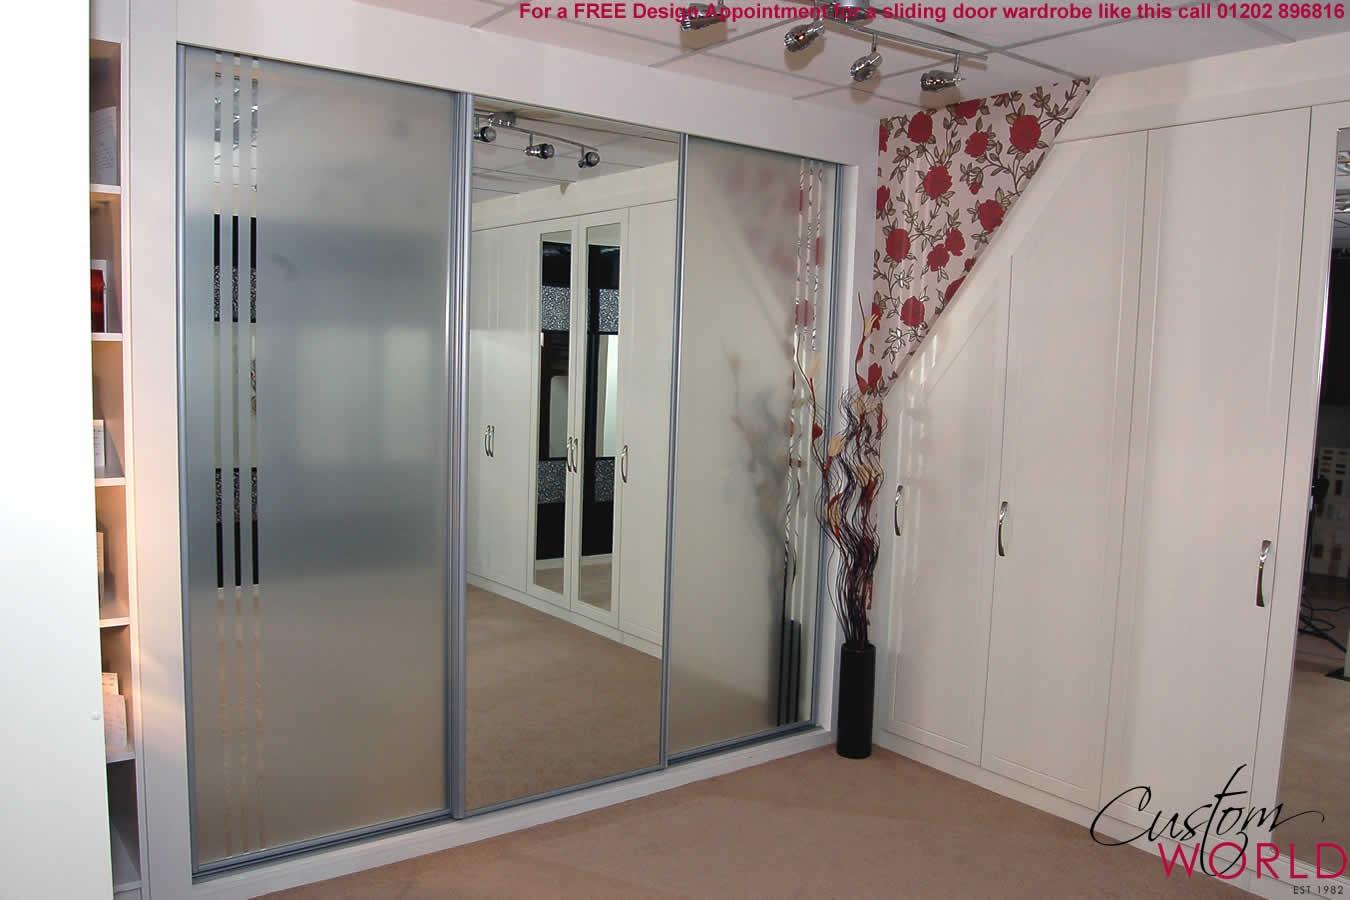 Mirrored Sliding Door Wardrobe Kit Sliding Doors